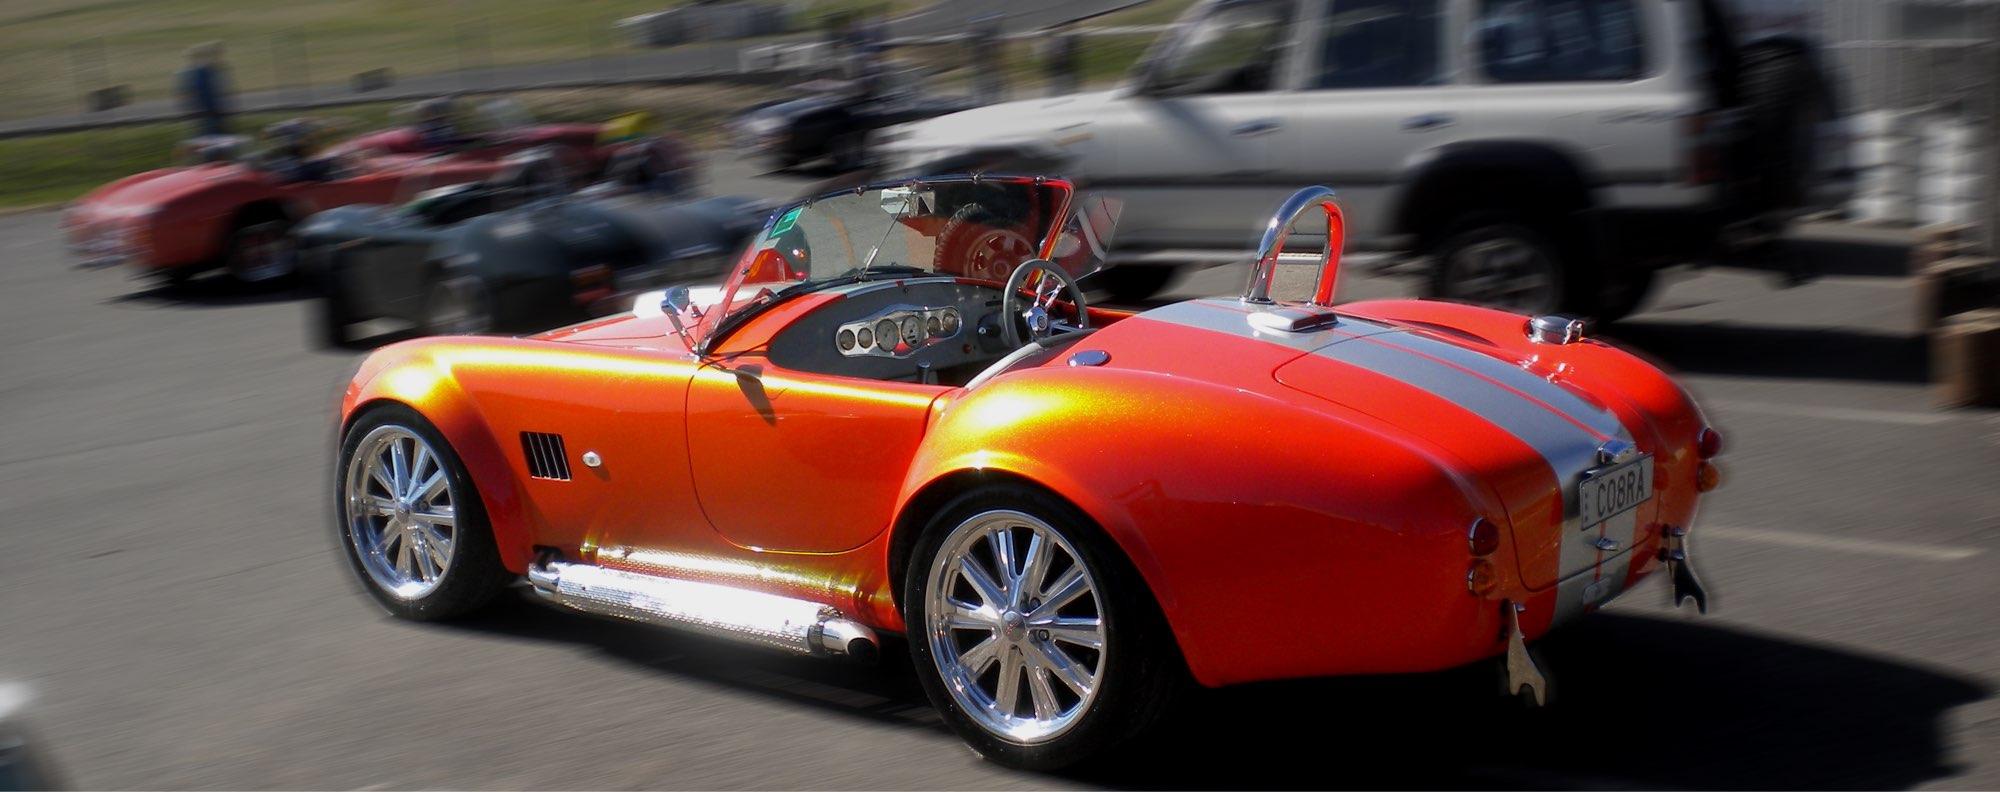 Classic Revival - Cobra Replica Kit Cars ǀ AC Cobra 427 ǀ Shelby Cobra Kit